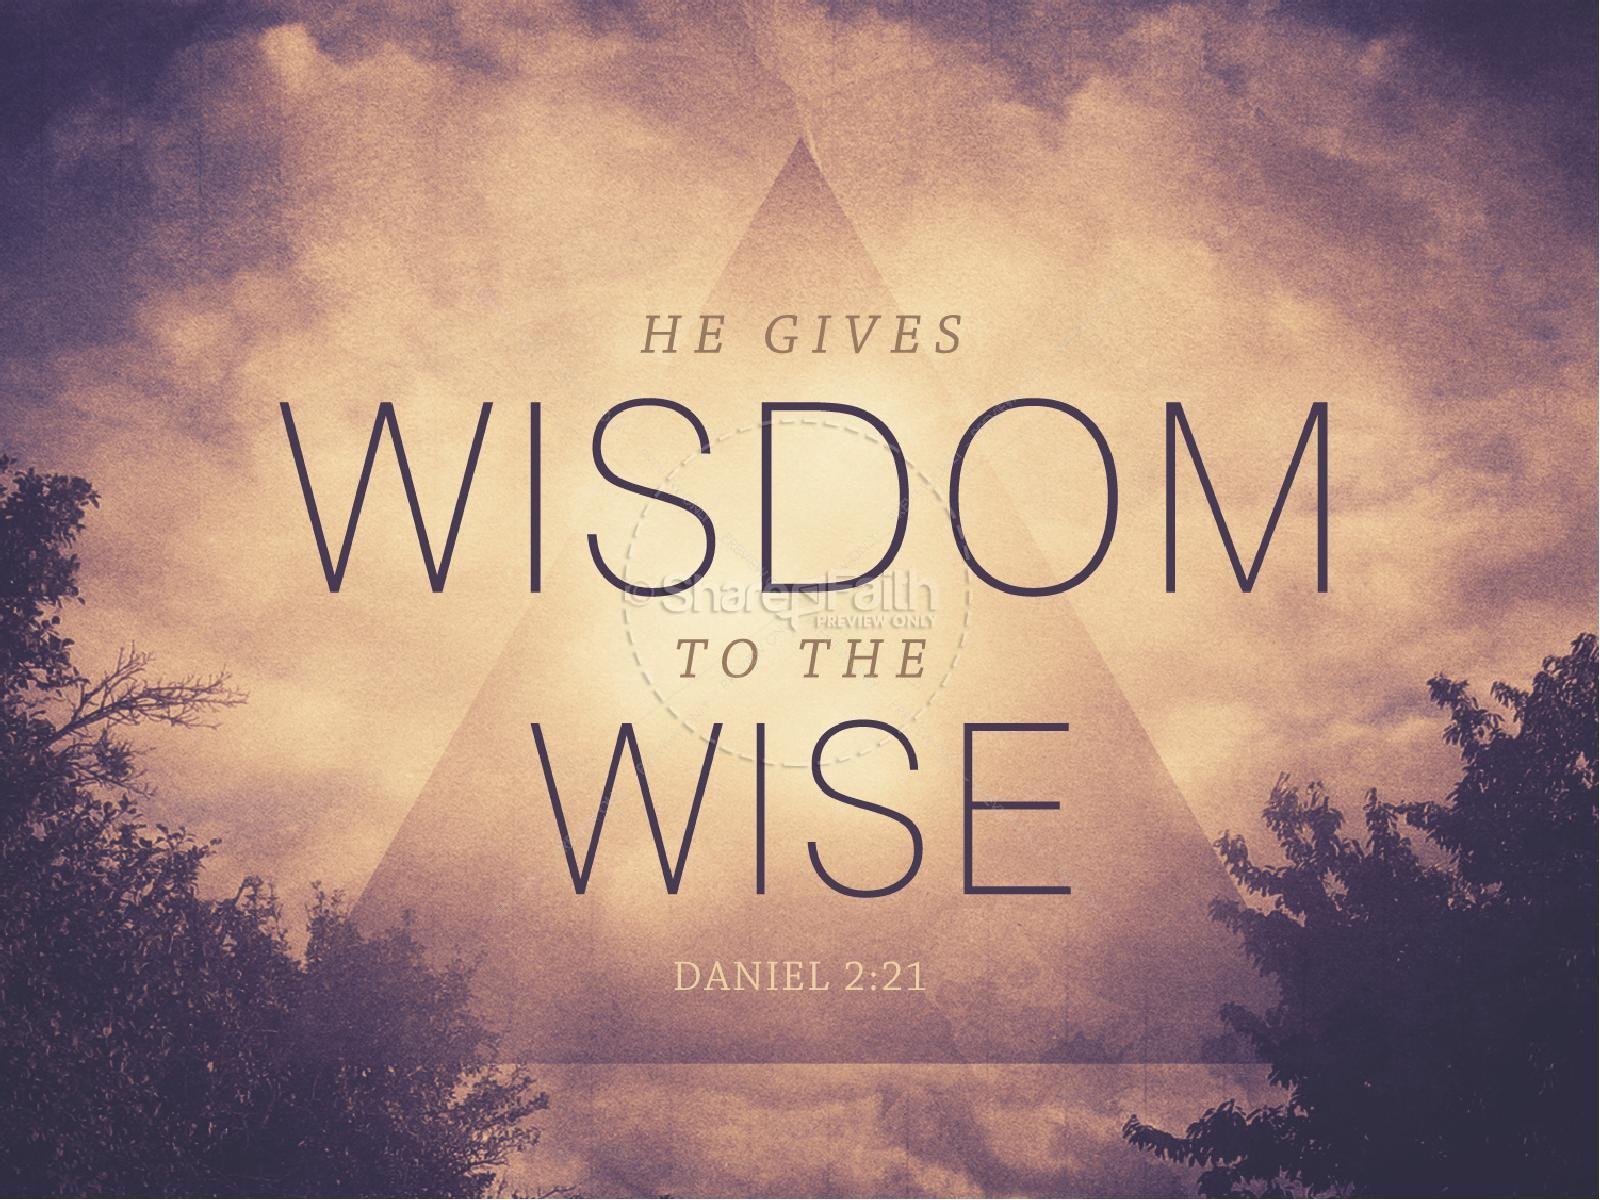 Christian Wallpaper Fall Offering He Gives Wisdom Church Powerpoint